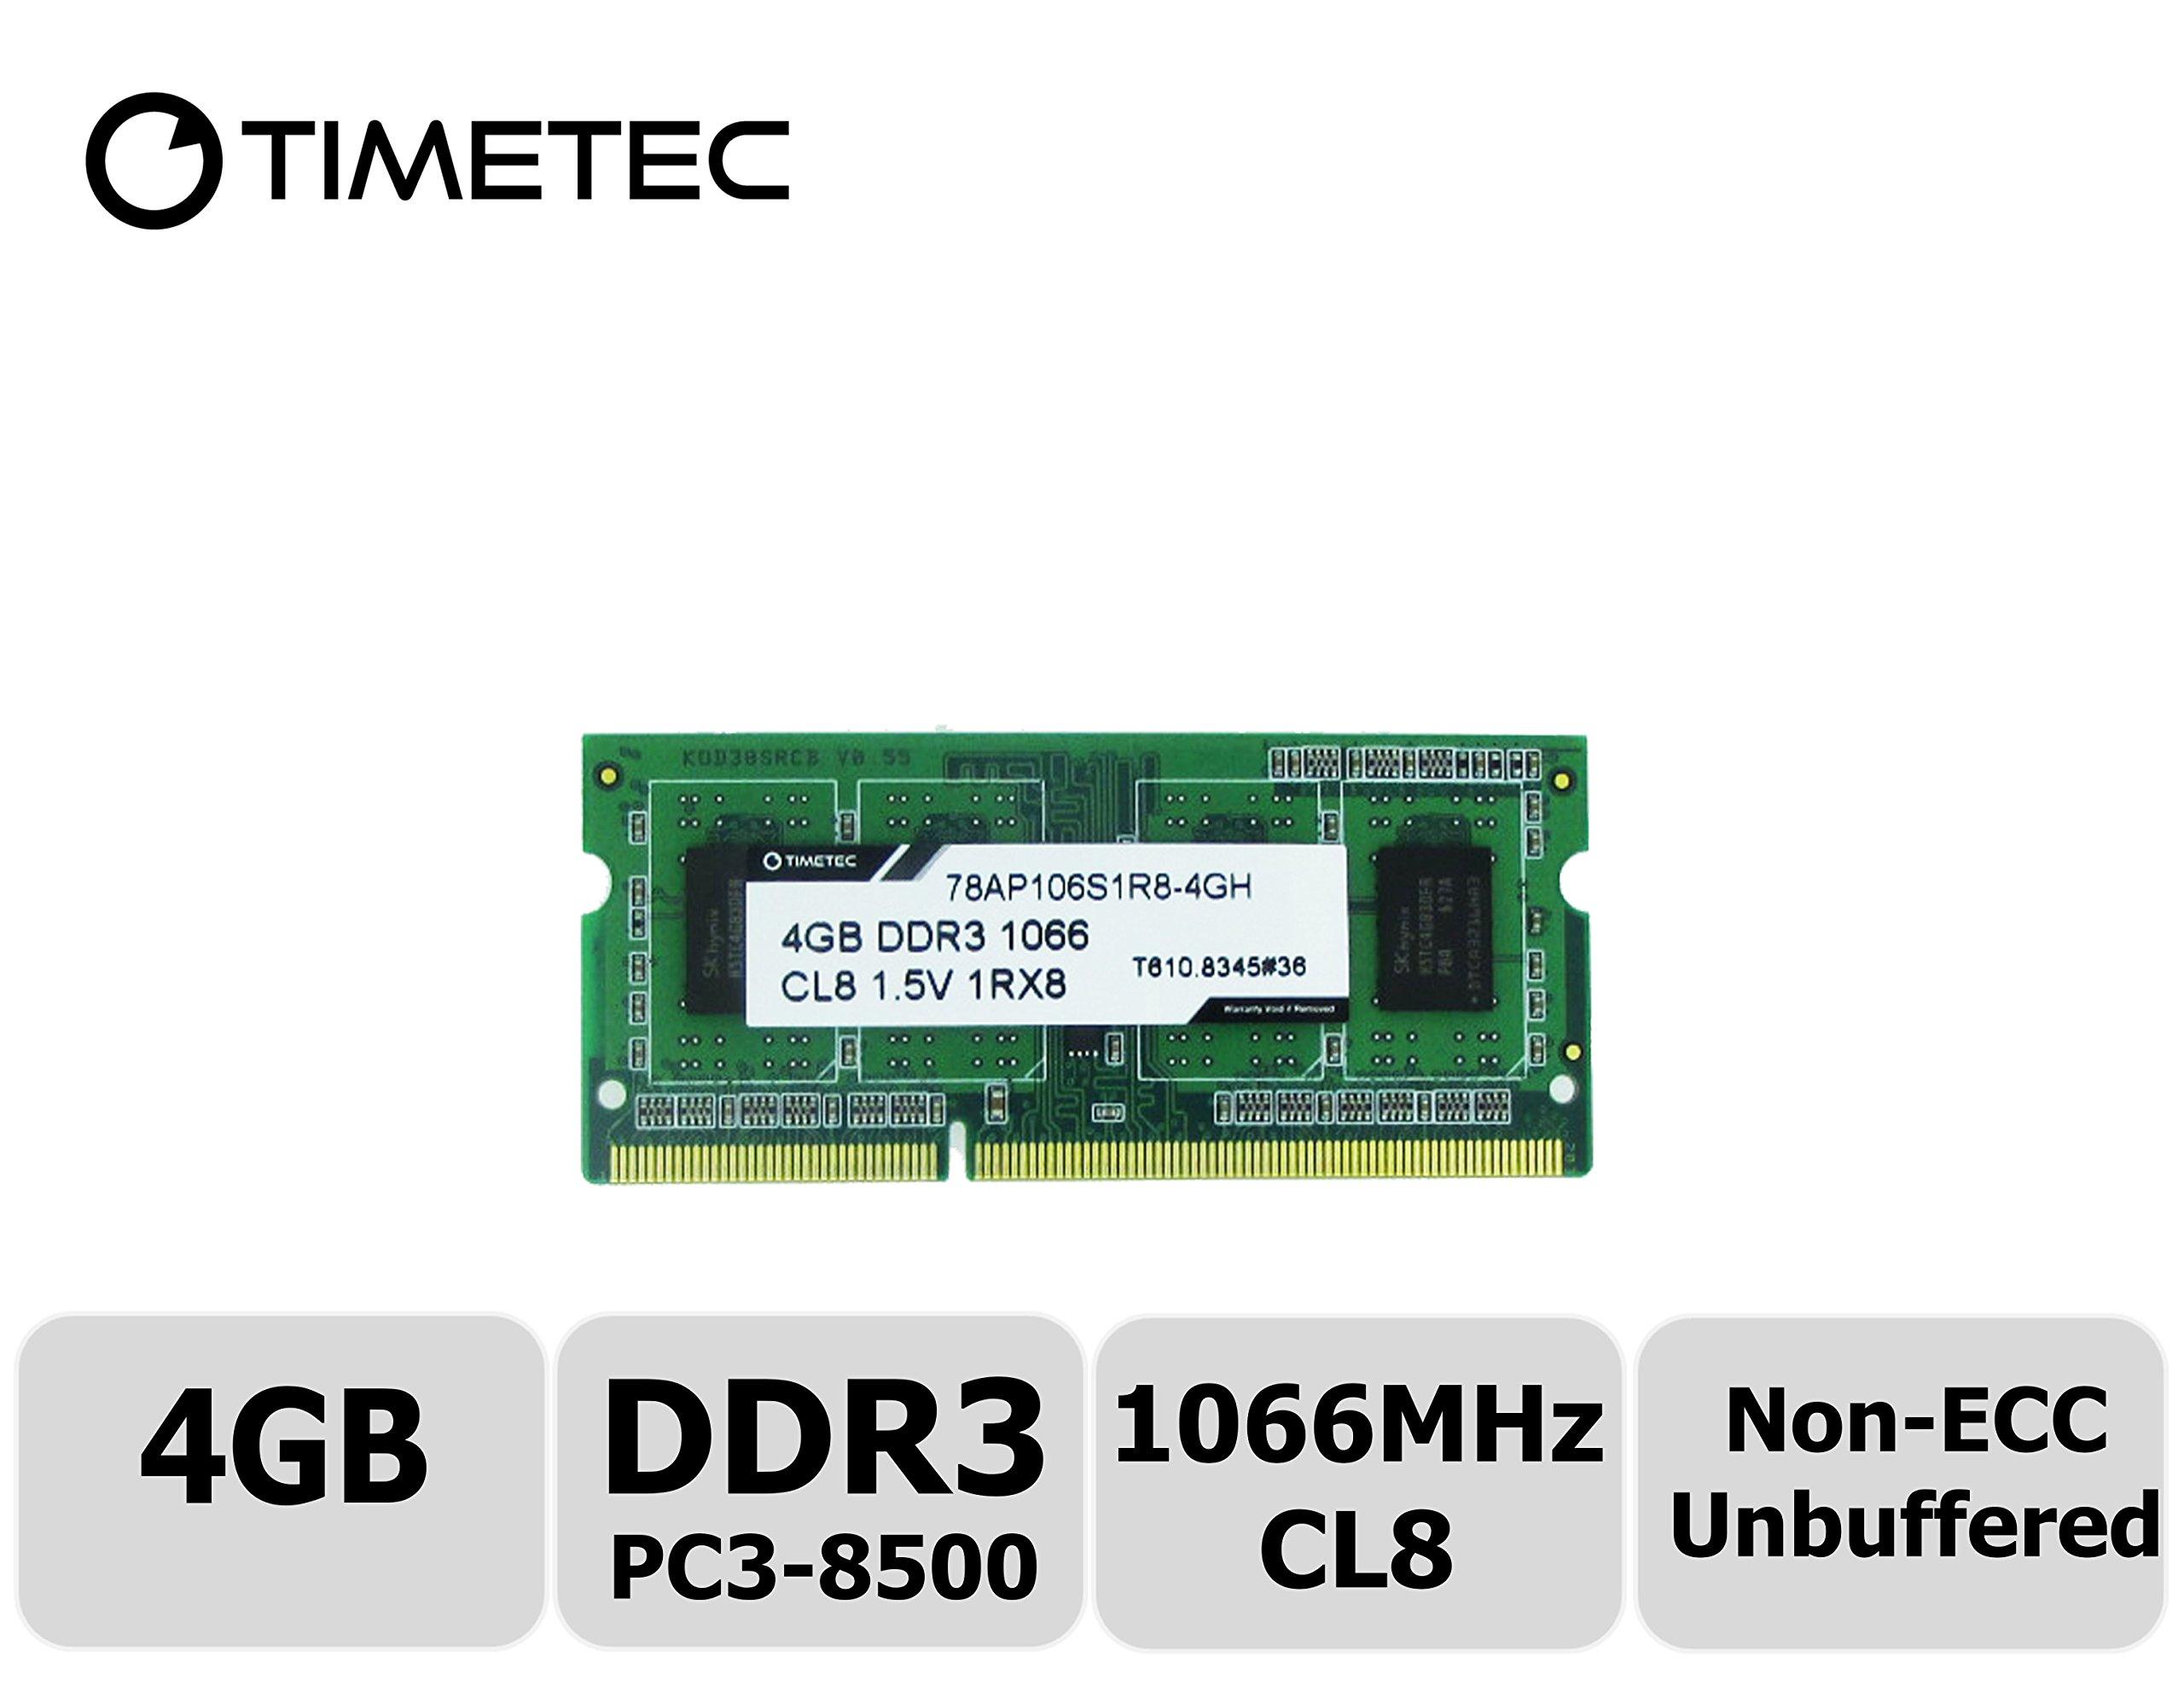 Timetec Hynix IC 4GB DDR3 1066MHz PC3-8500 Unbuffered Non-ECC 1.5V CL7 1Rx8 Single Rank 204 Pin SODIMM Laptop Notebook Computer Memory Ram Module Upgrade (High Density 4GB)